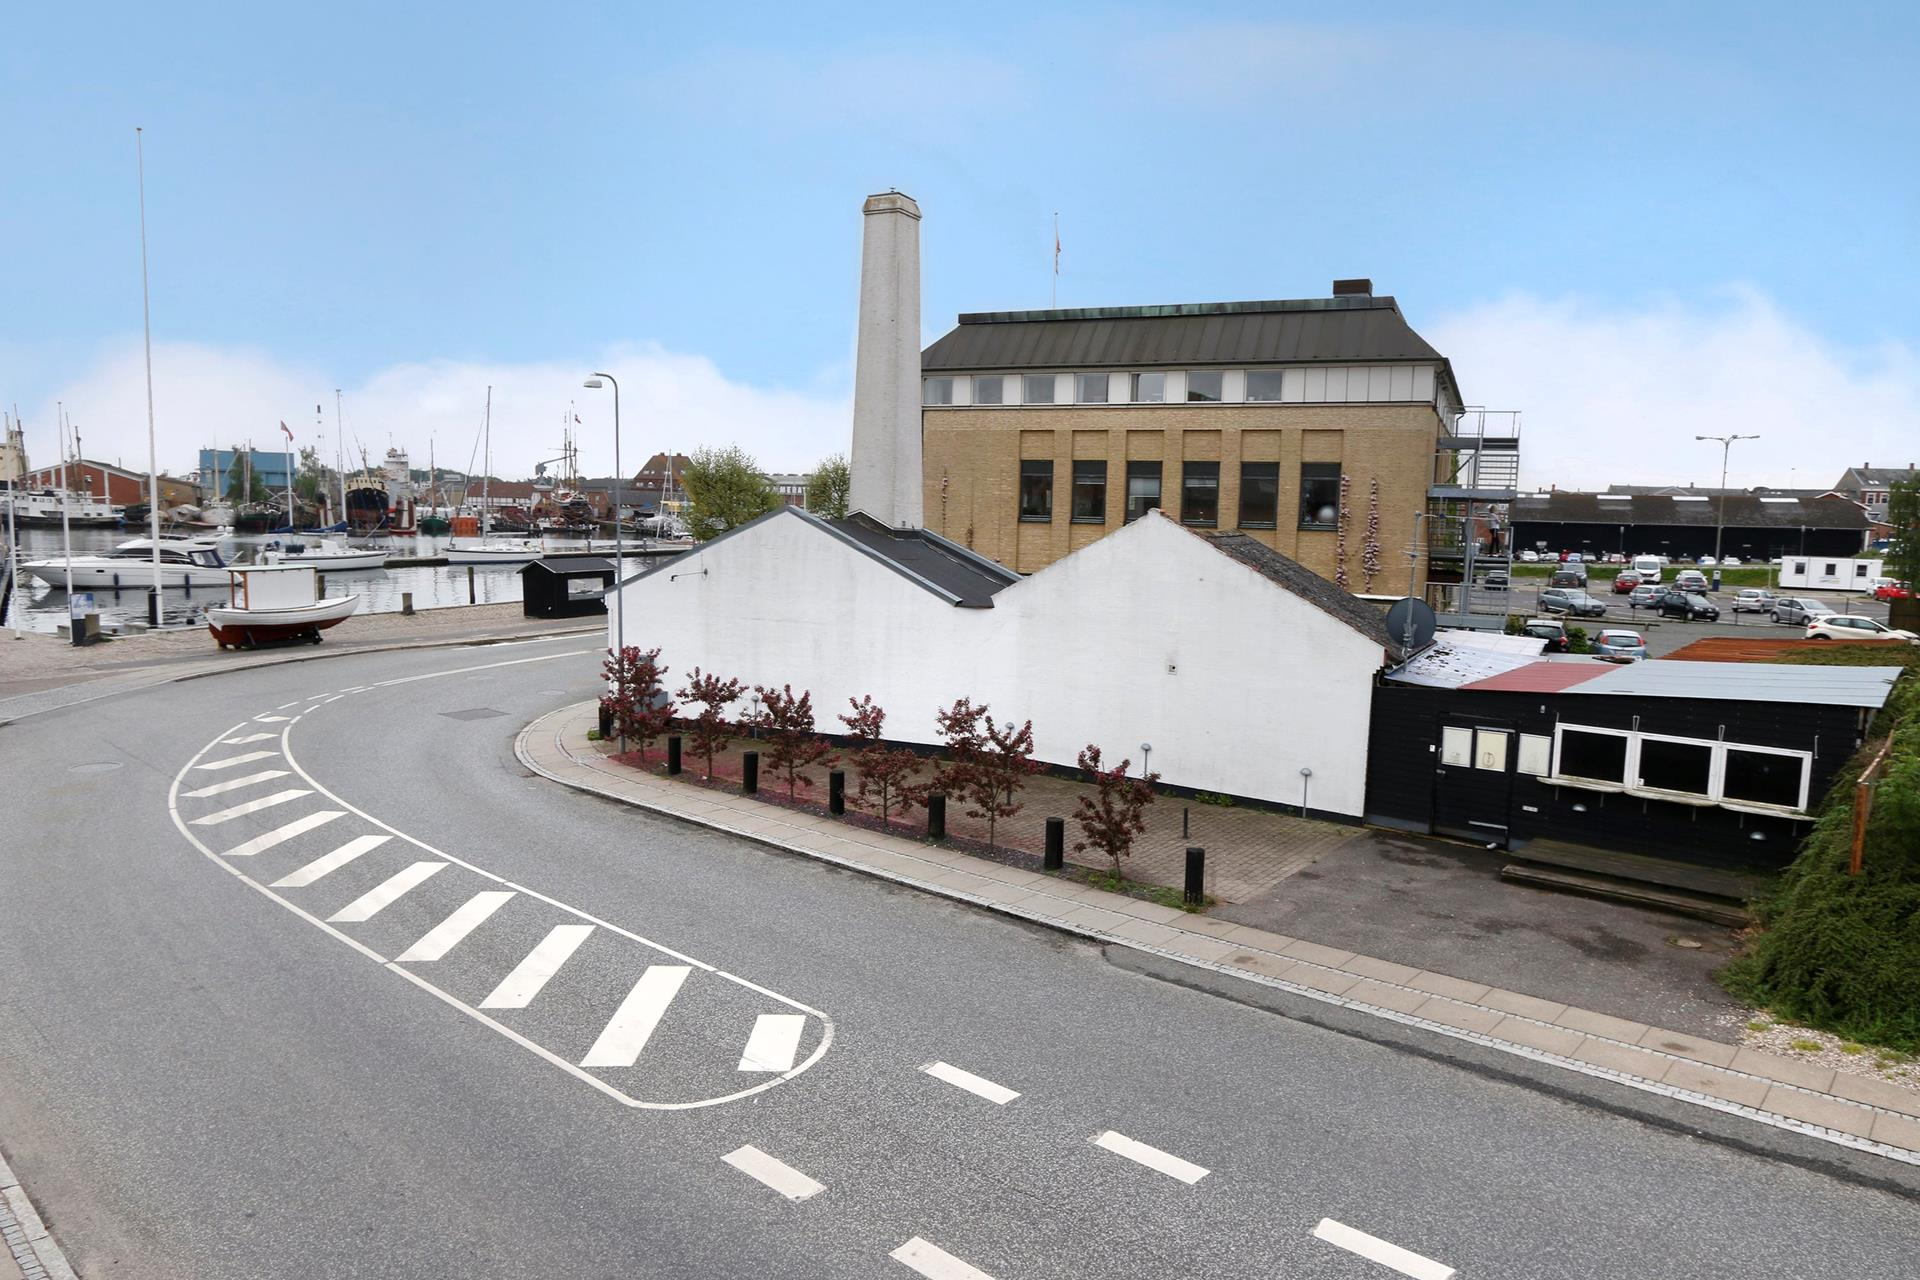 Bolig/erhverv på Jessens Mole i Svendborg - Mastefoto